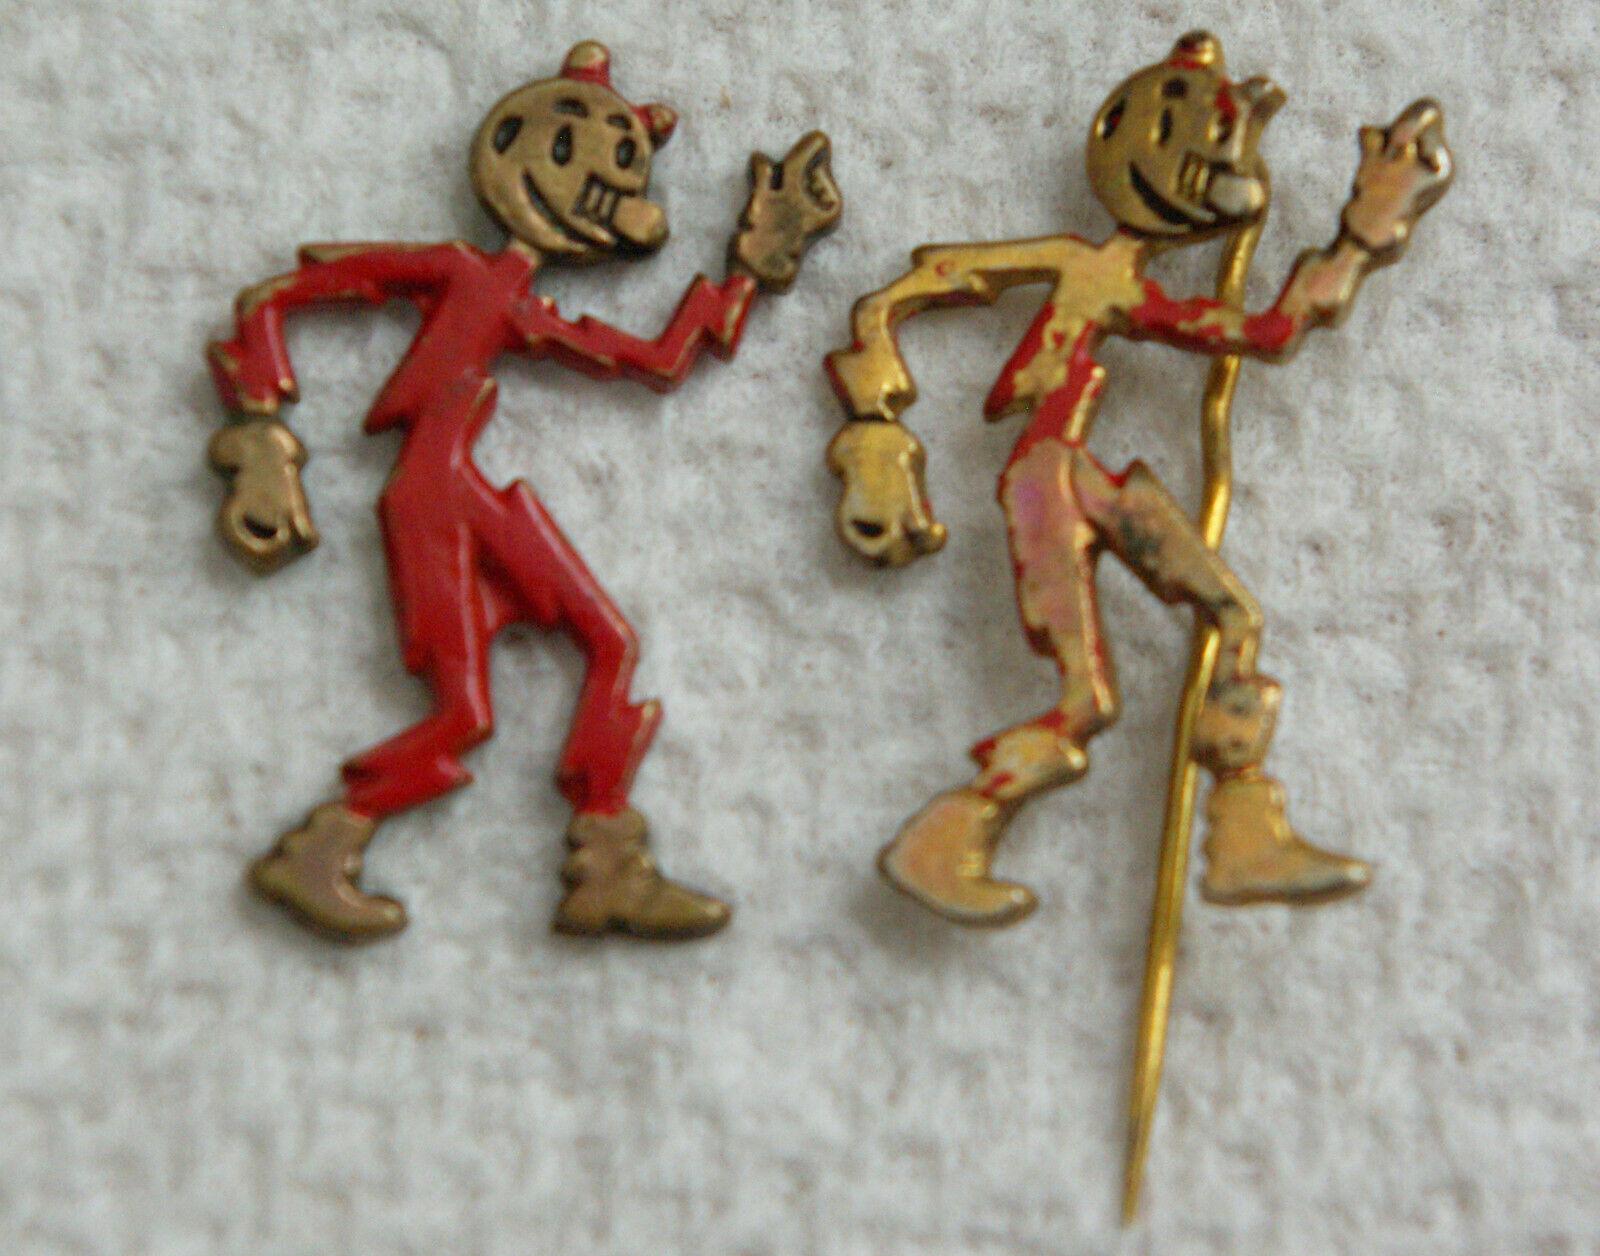 Vintage Reddy Kilowatt Pins Electrical Cartoon Character Lot Of 2 - $11.99